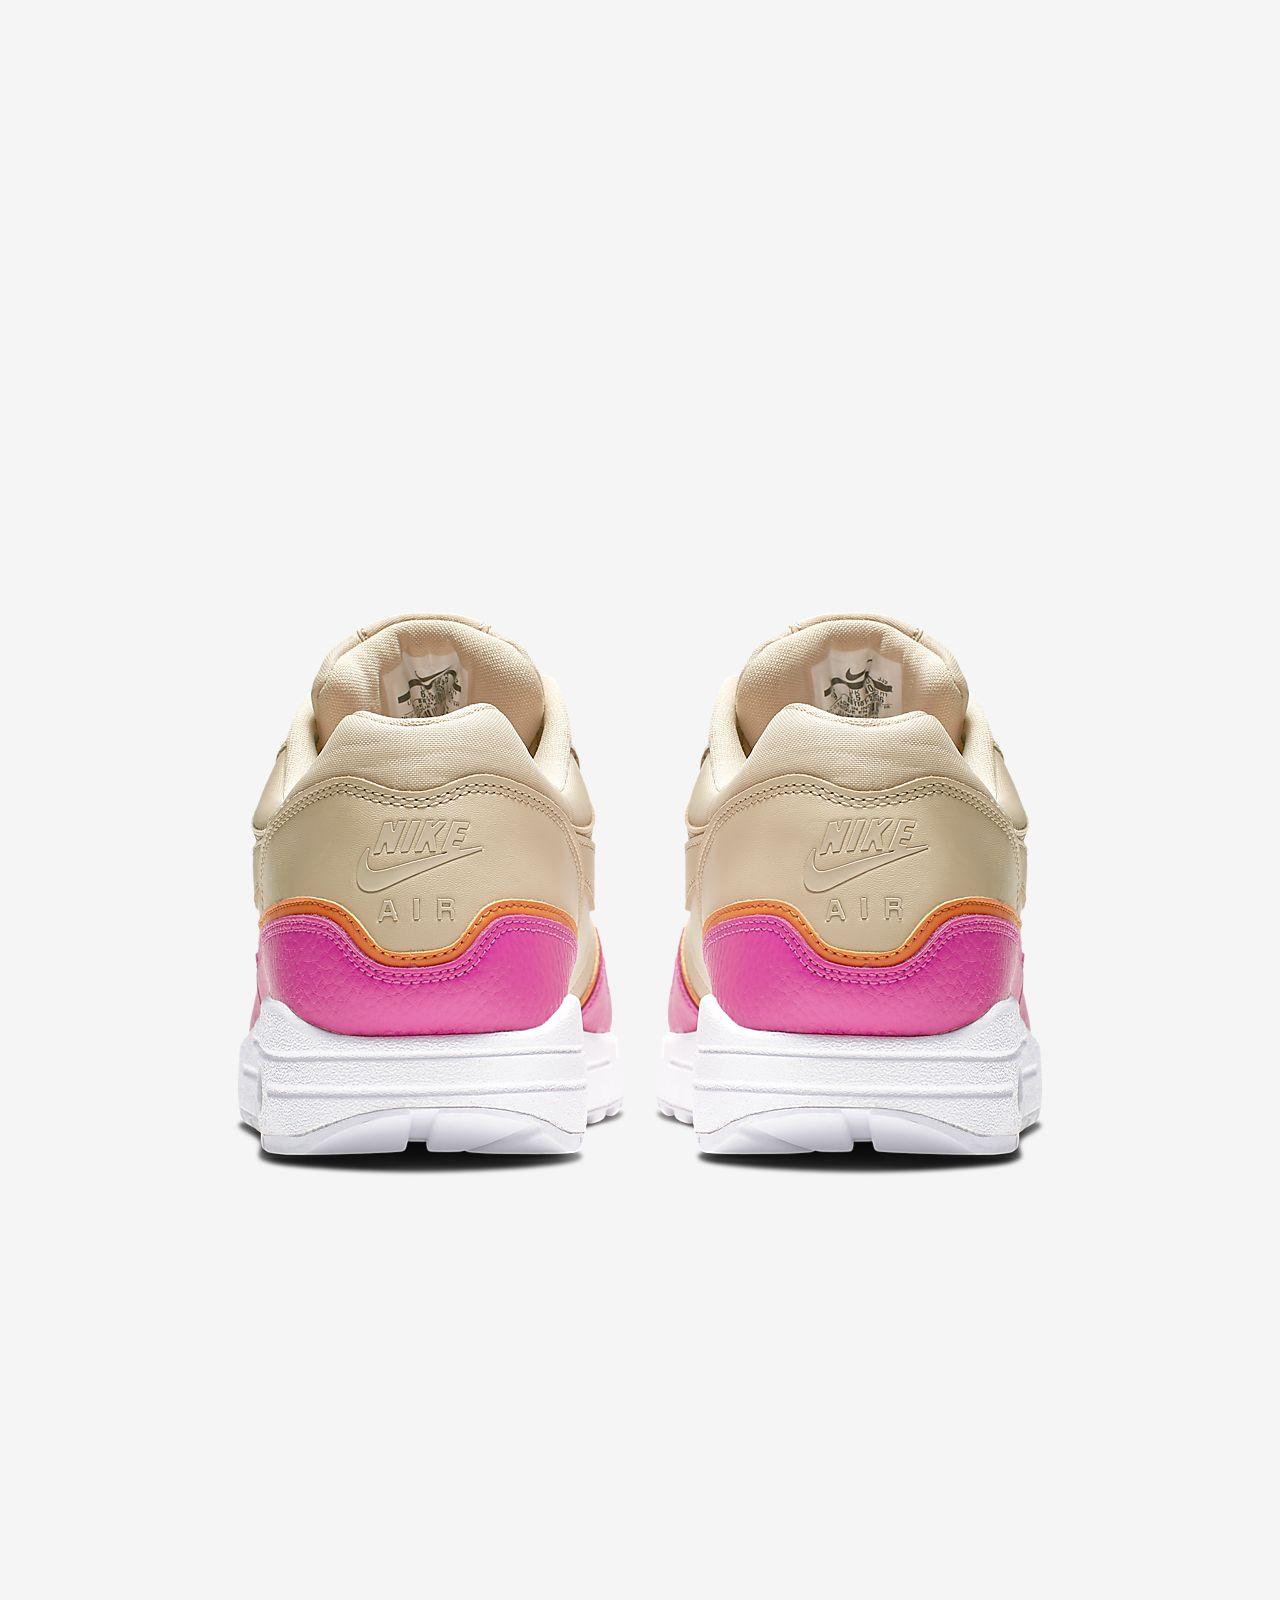 super popular f377b 9ca84 ... Nike Air Max 1 SE Women s Shoe